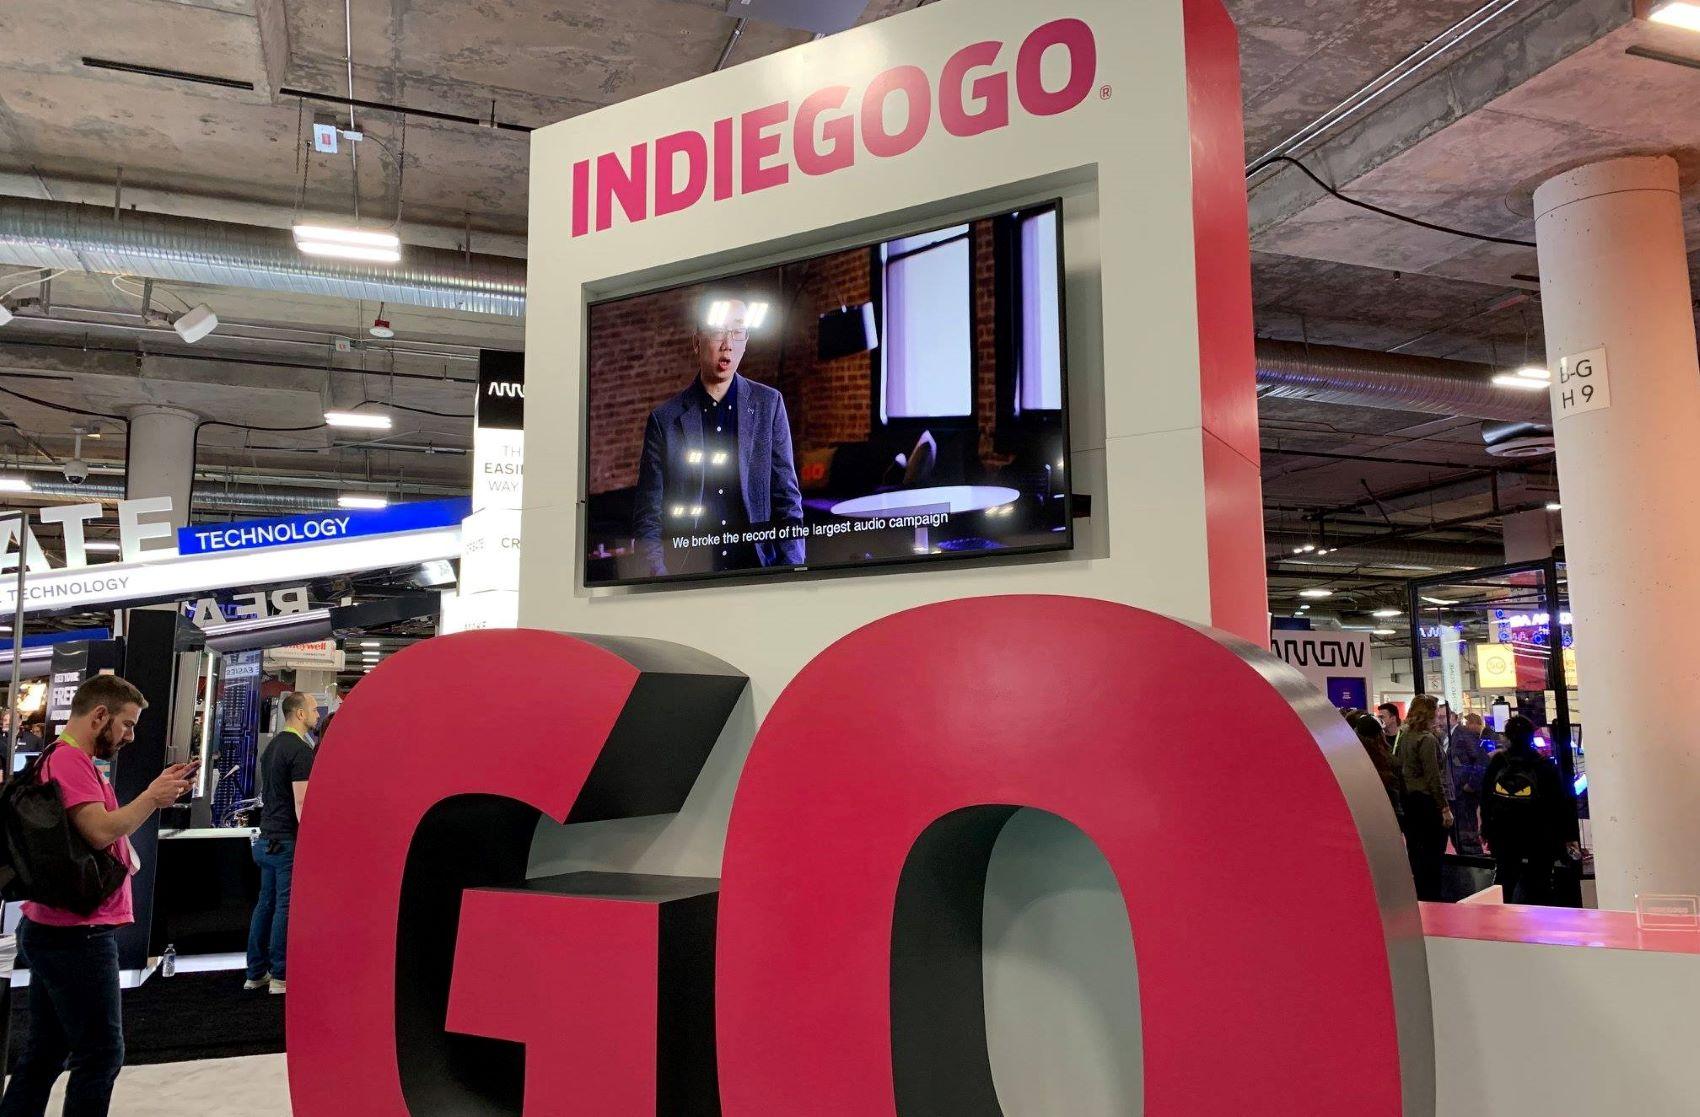 Indiegogo booth at a tradeshow